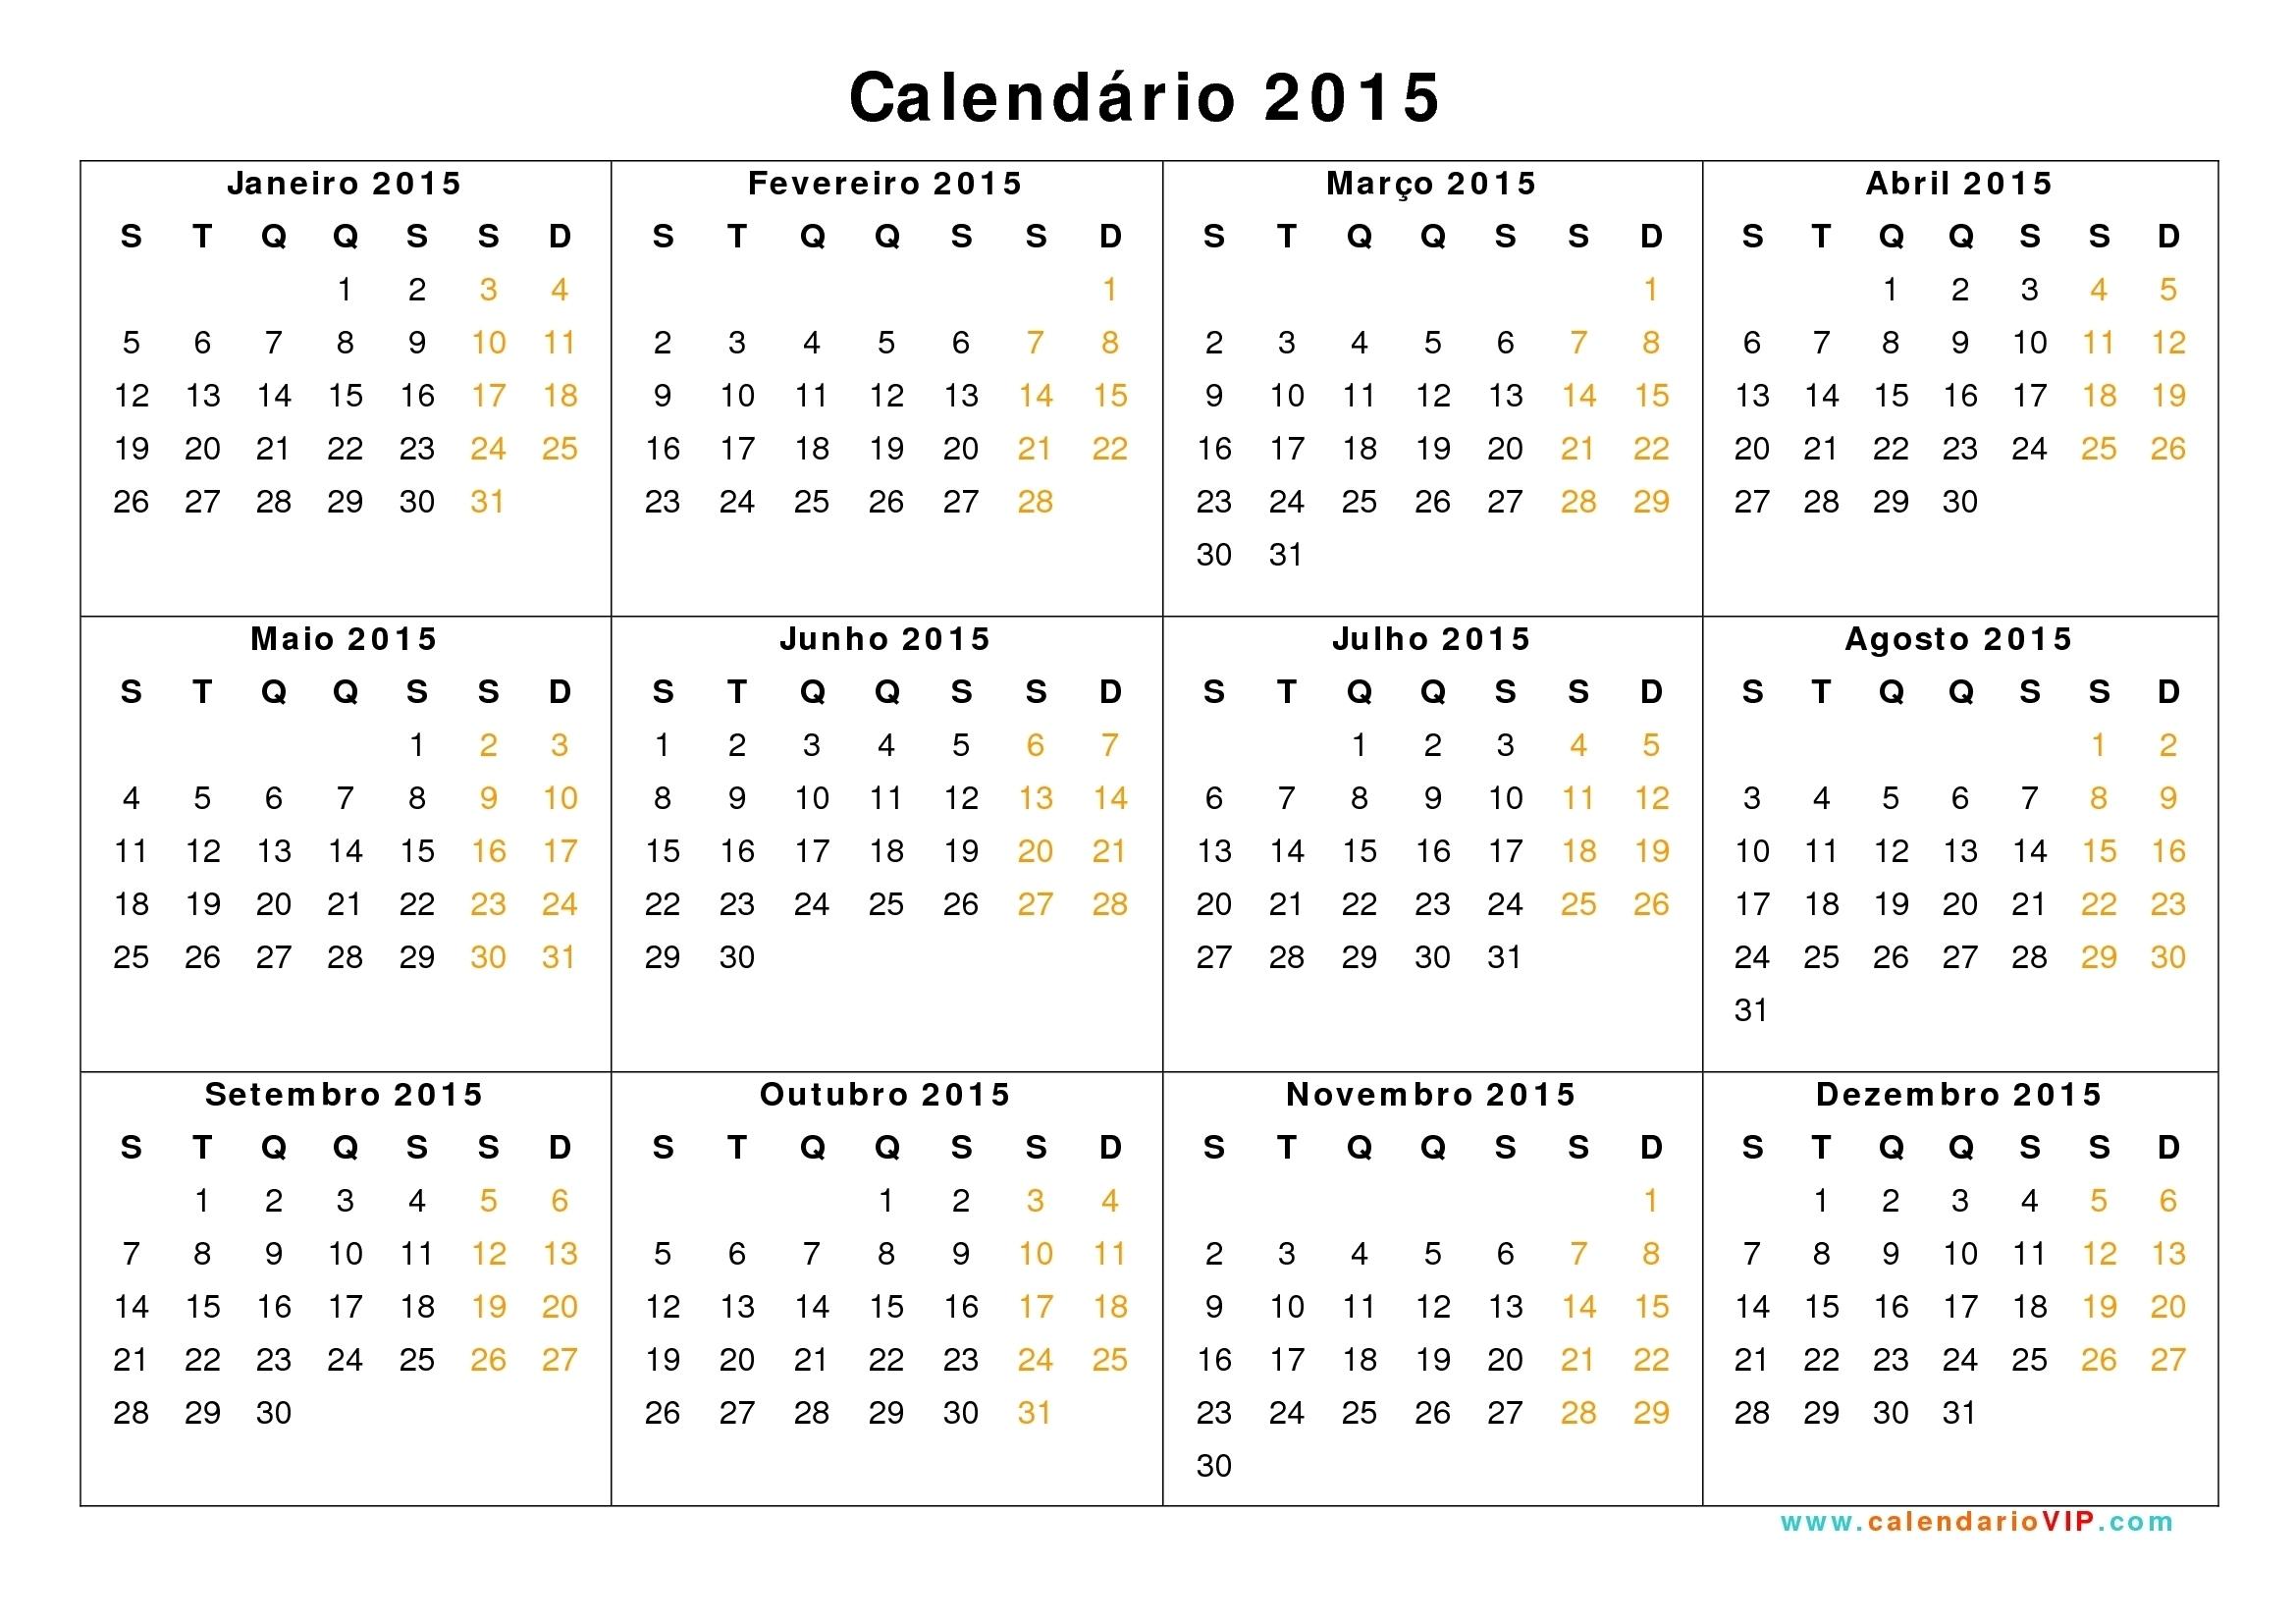 Calendario 2015 Para Imprimir Pdf | Template Calendar Printable in Calendario 2015 Para Imprimir Pdf